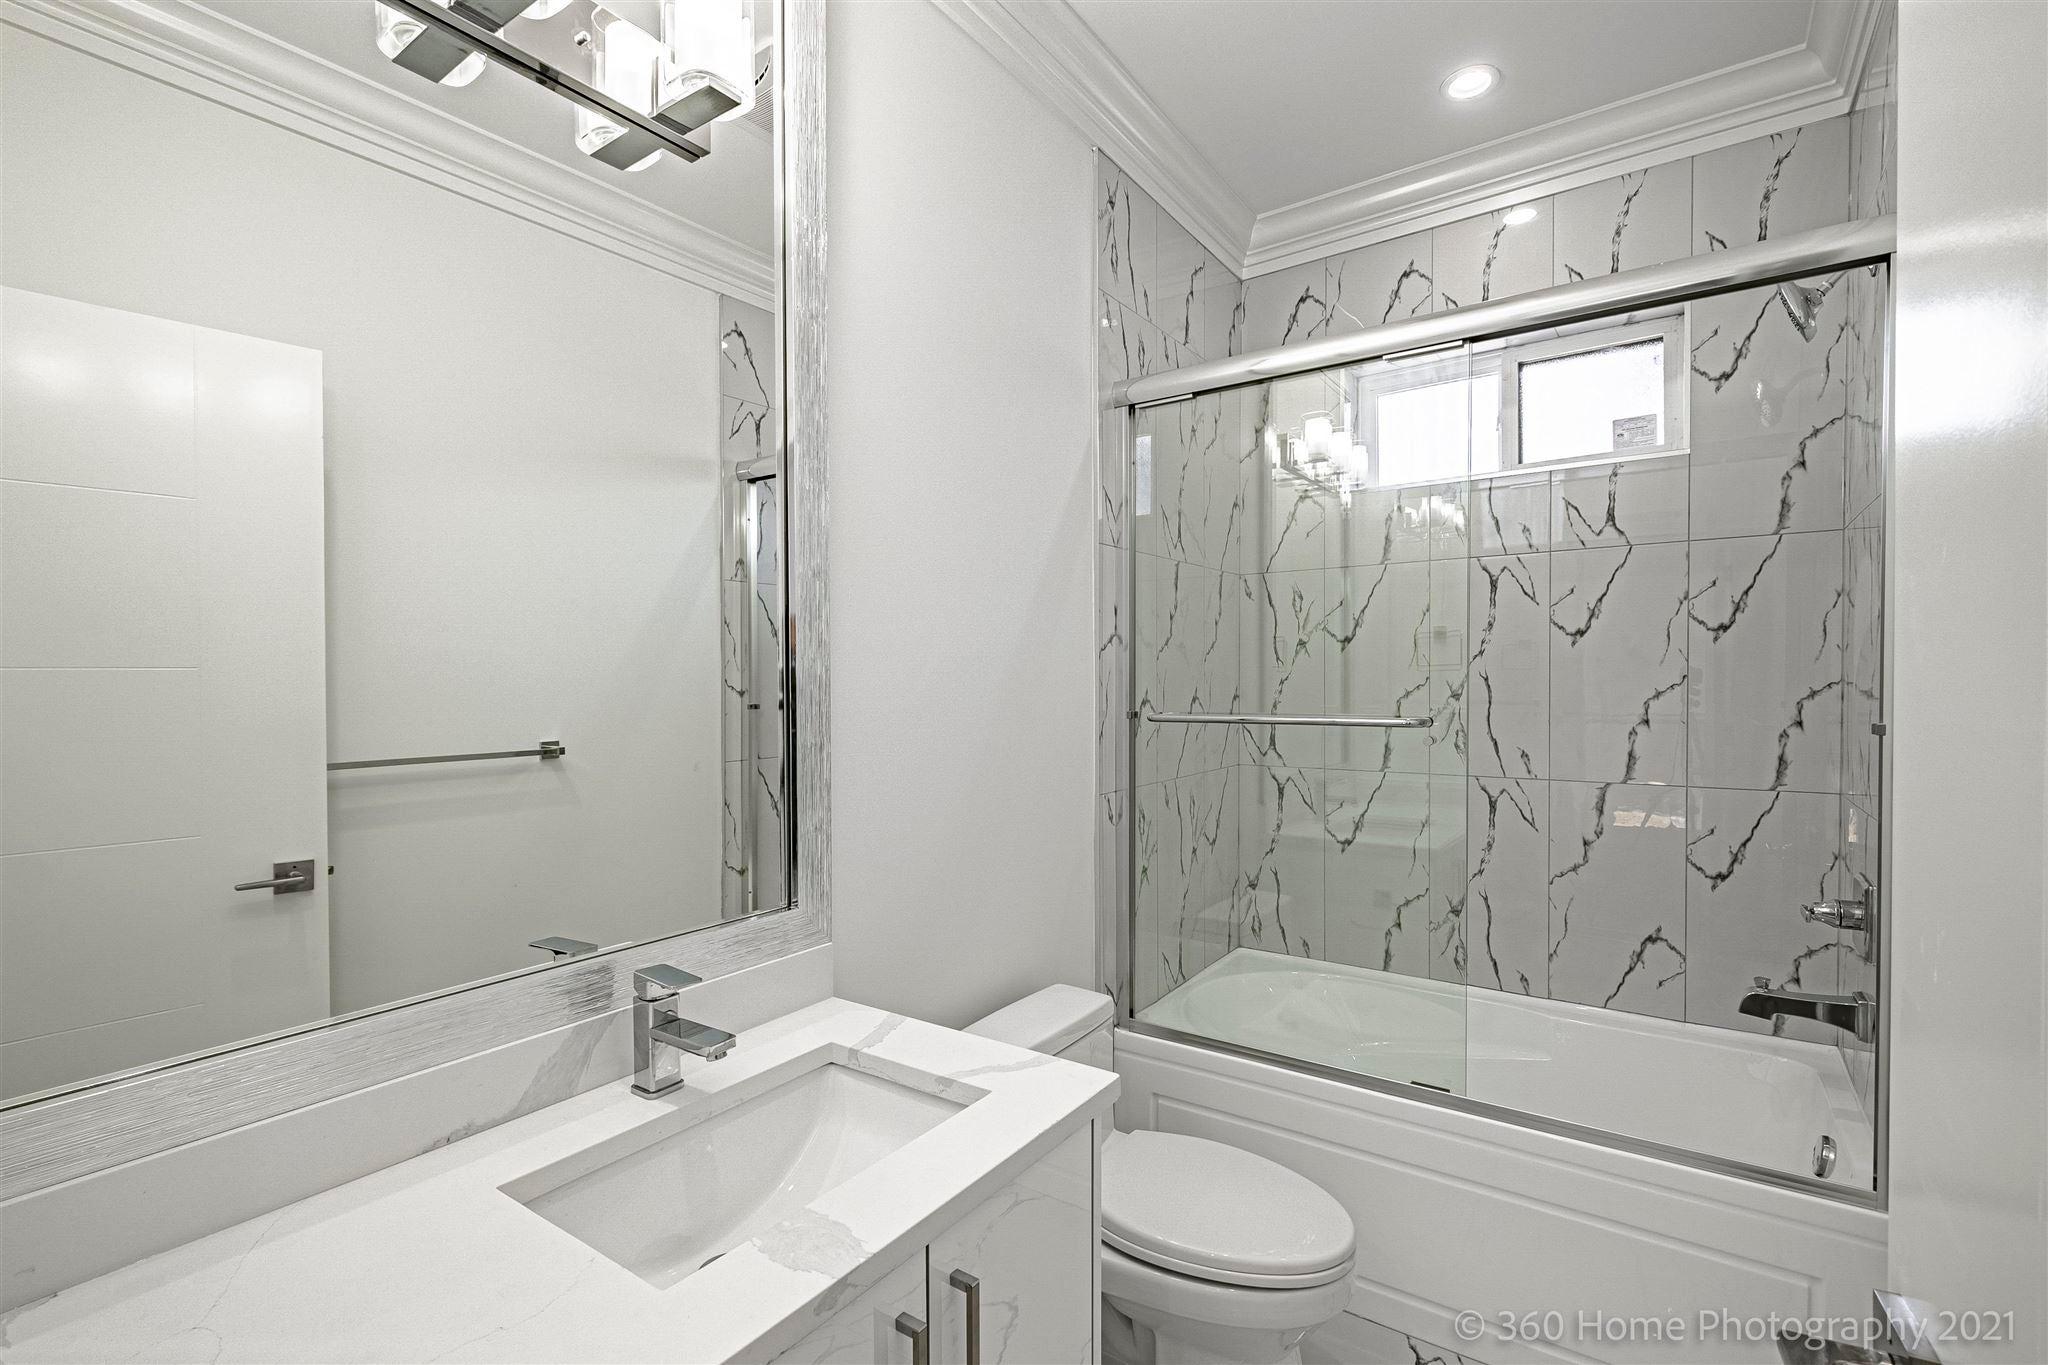 13050 101B AVENUE - Cedar Hills House/Single Family for sale, 5 Bedrooms (R2602208) - #15